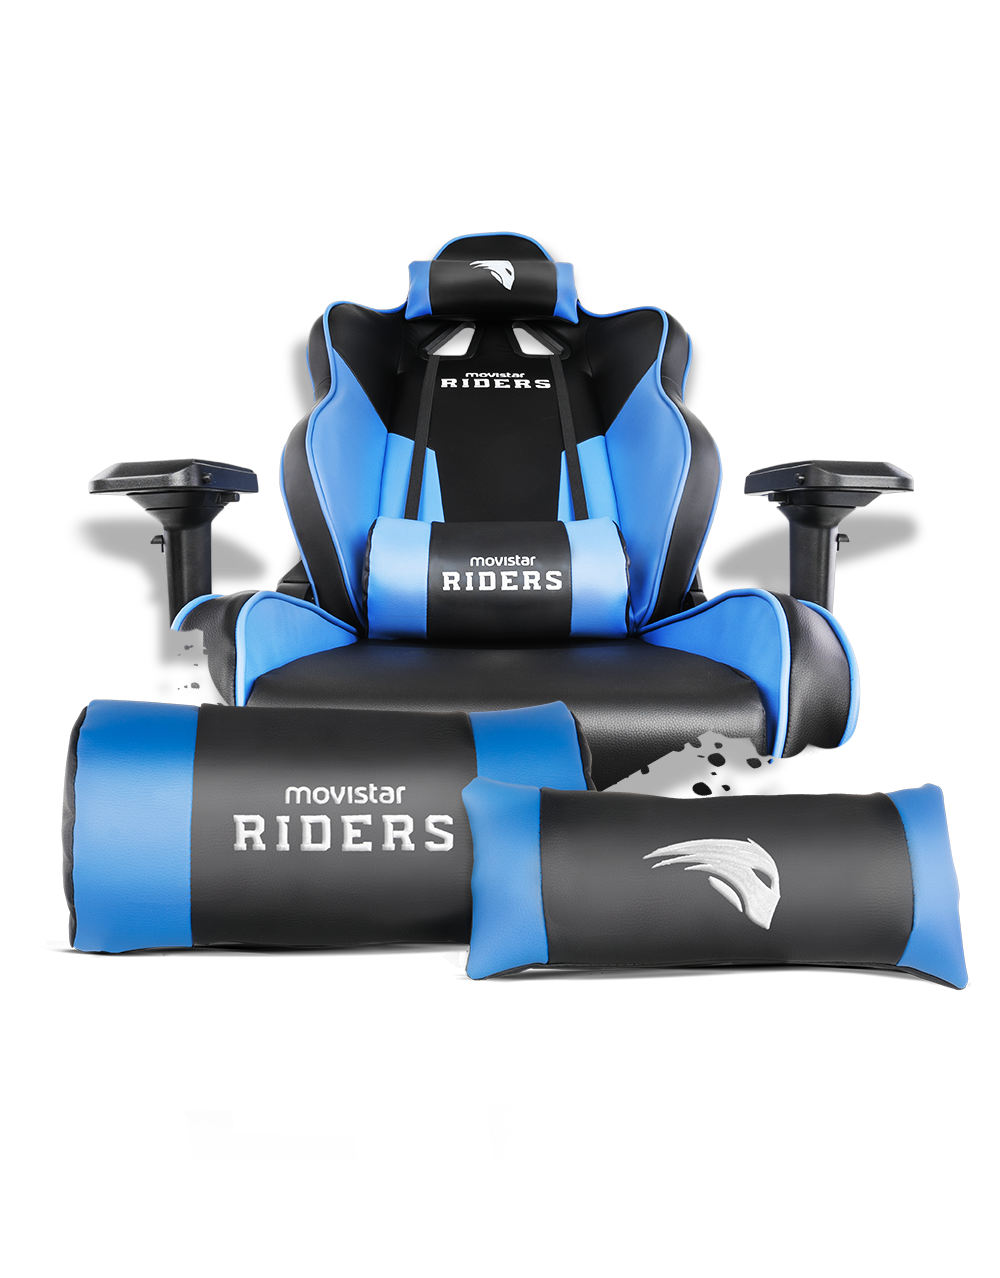 Drift Movistar Riders